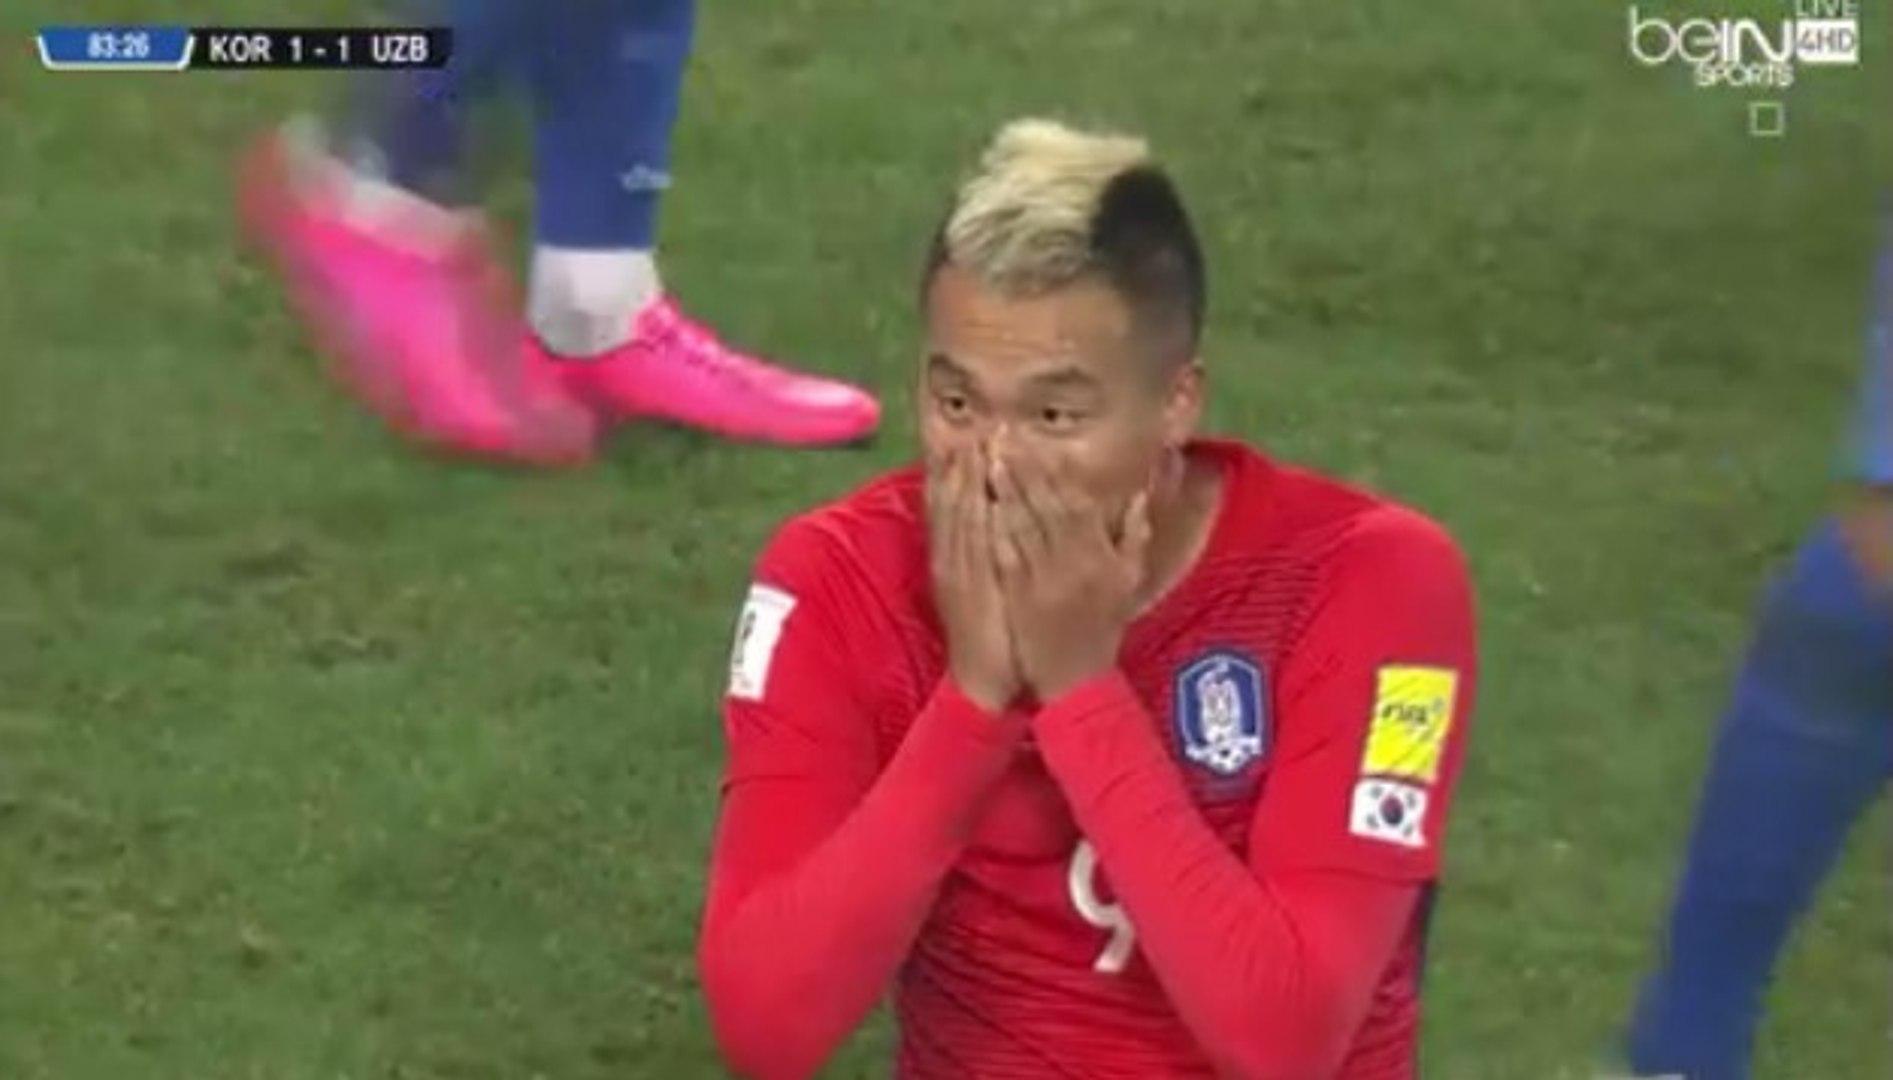 South Korea 2-1 Uzbekistan - All Goals Exclusive - (15/11/2016)